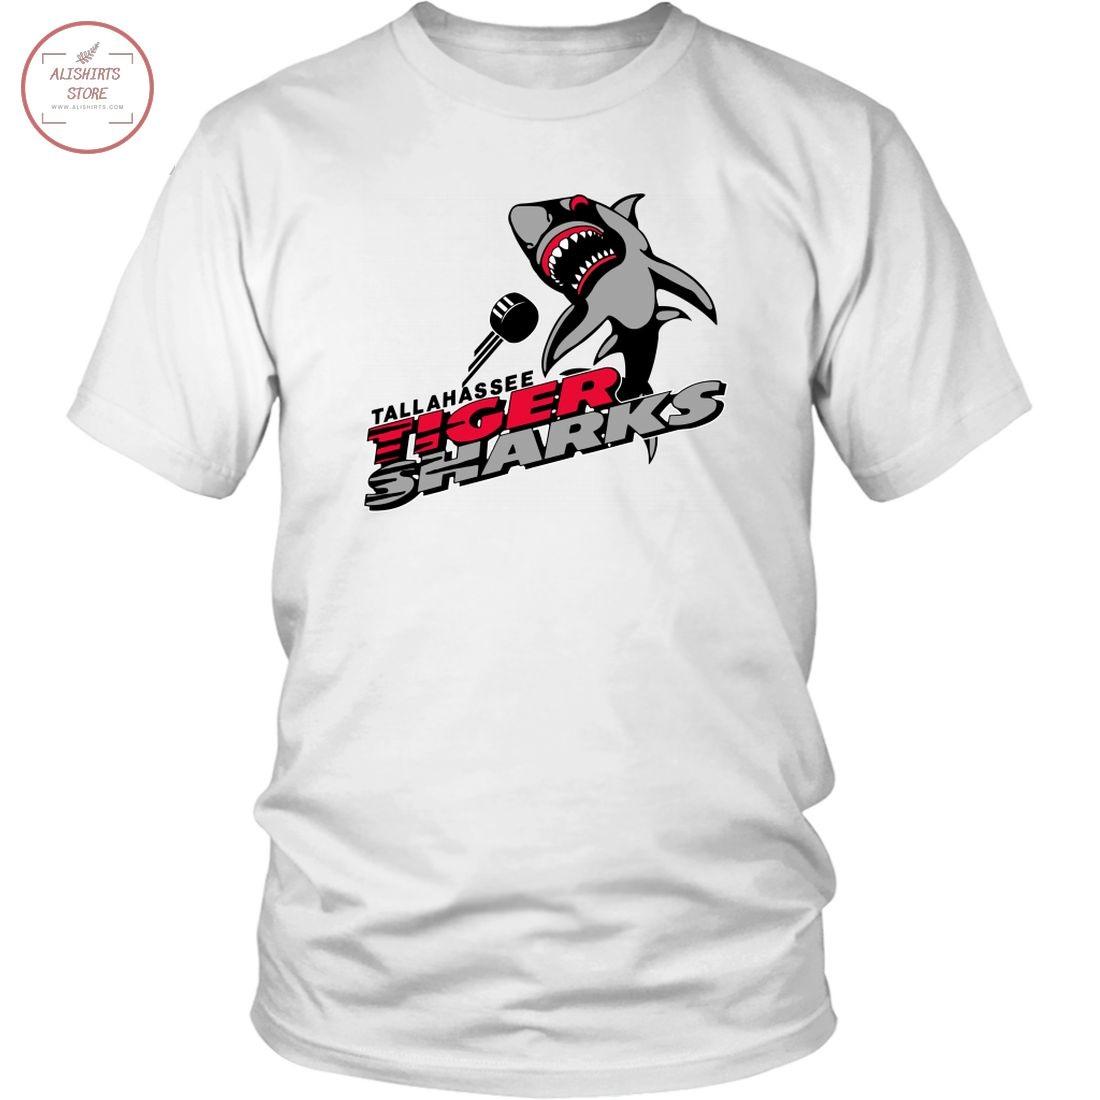 Tallahassee Tiger Sharks Tigersharks ECHL hockey shirt